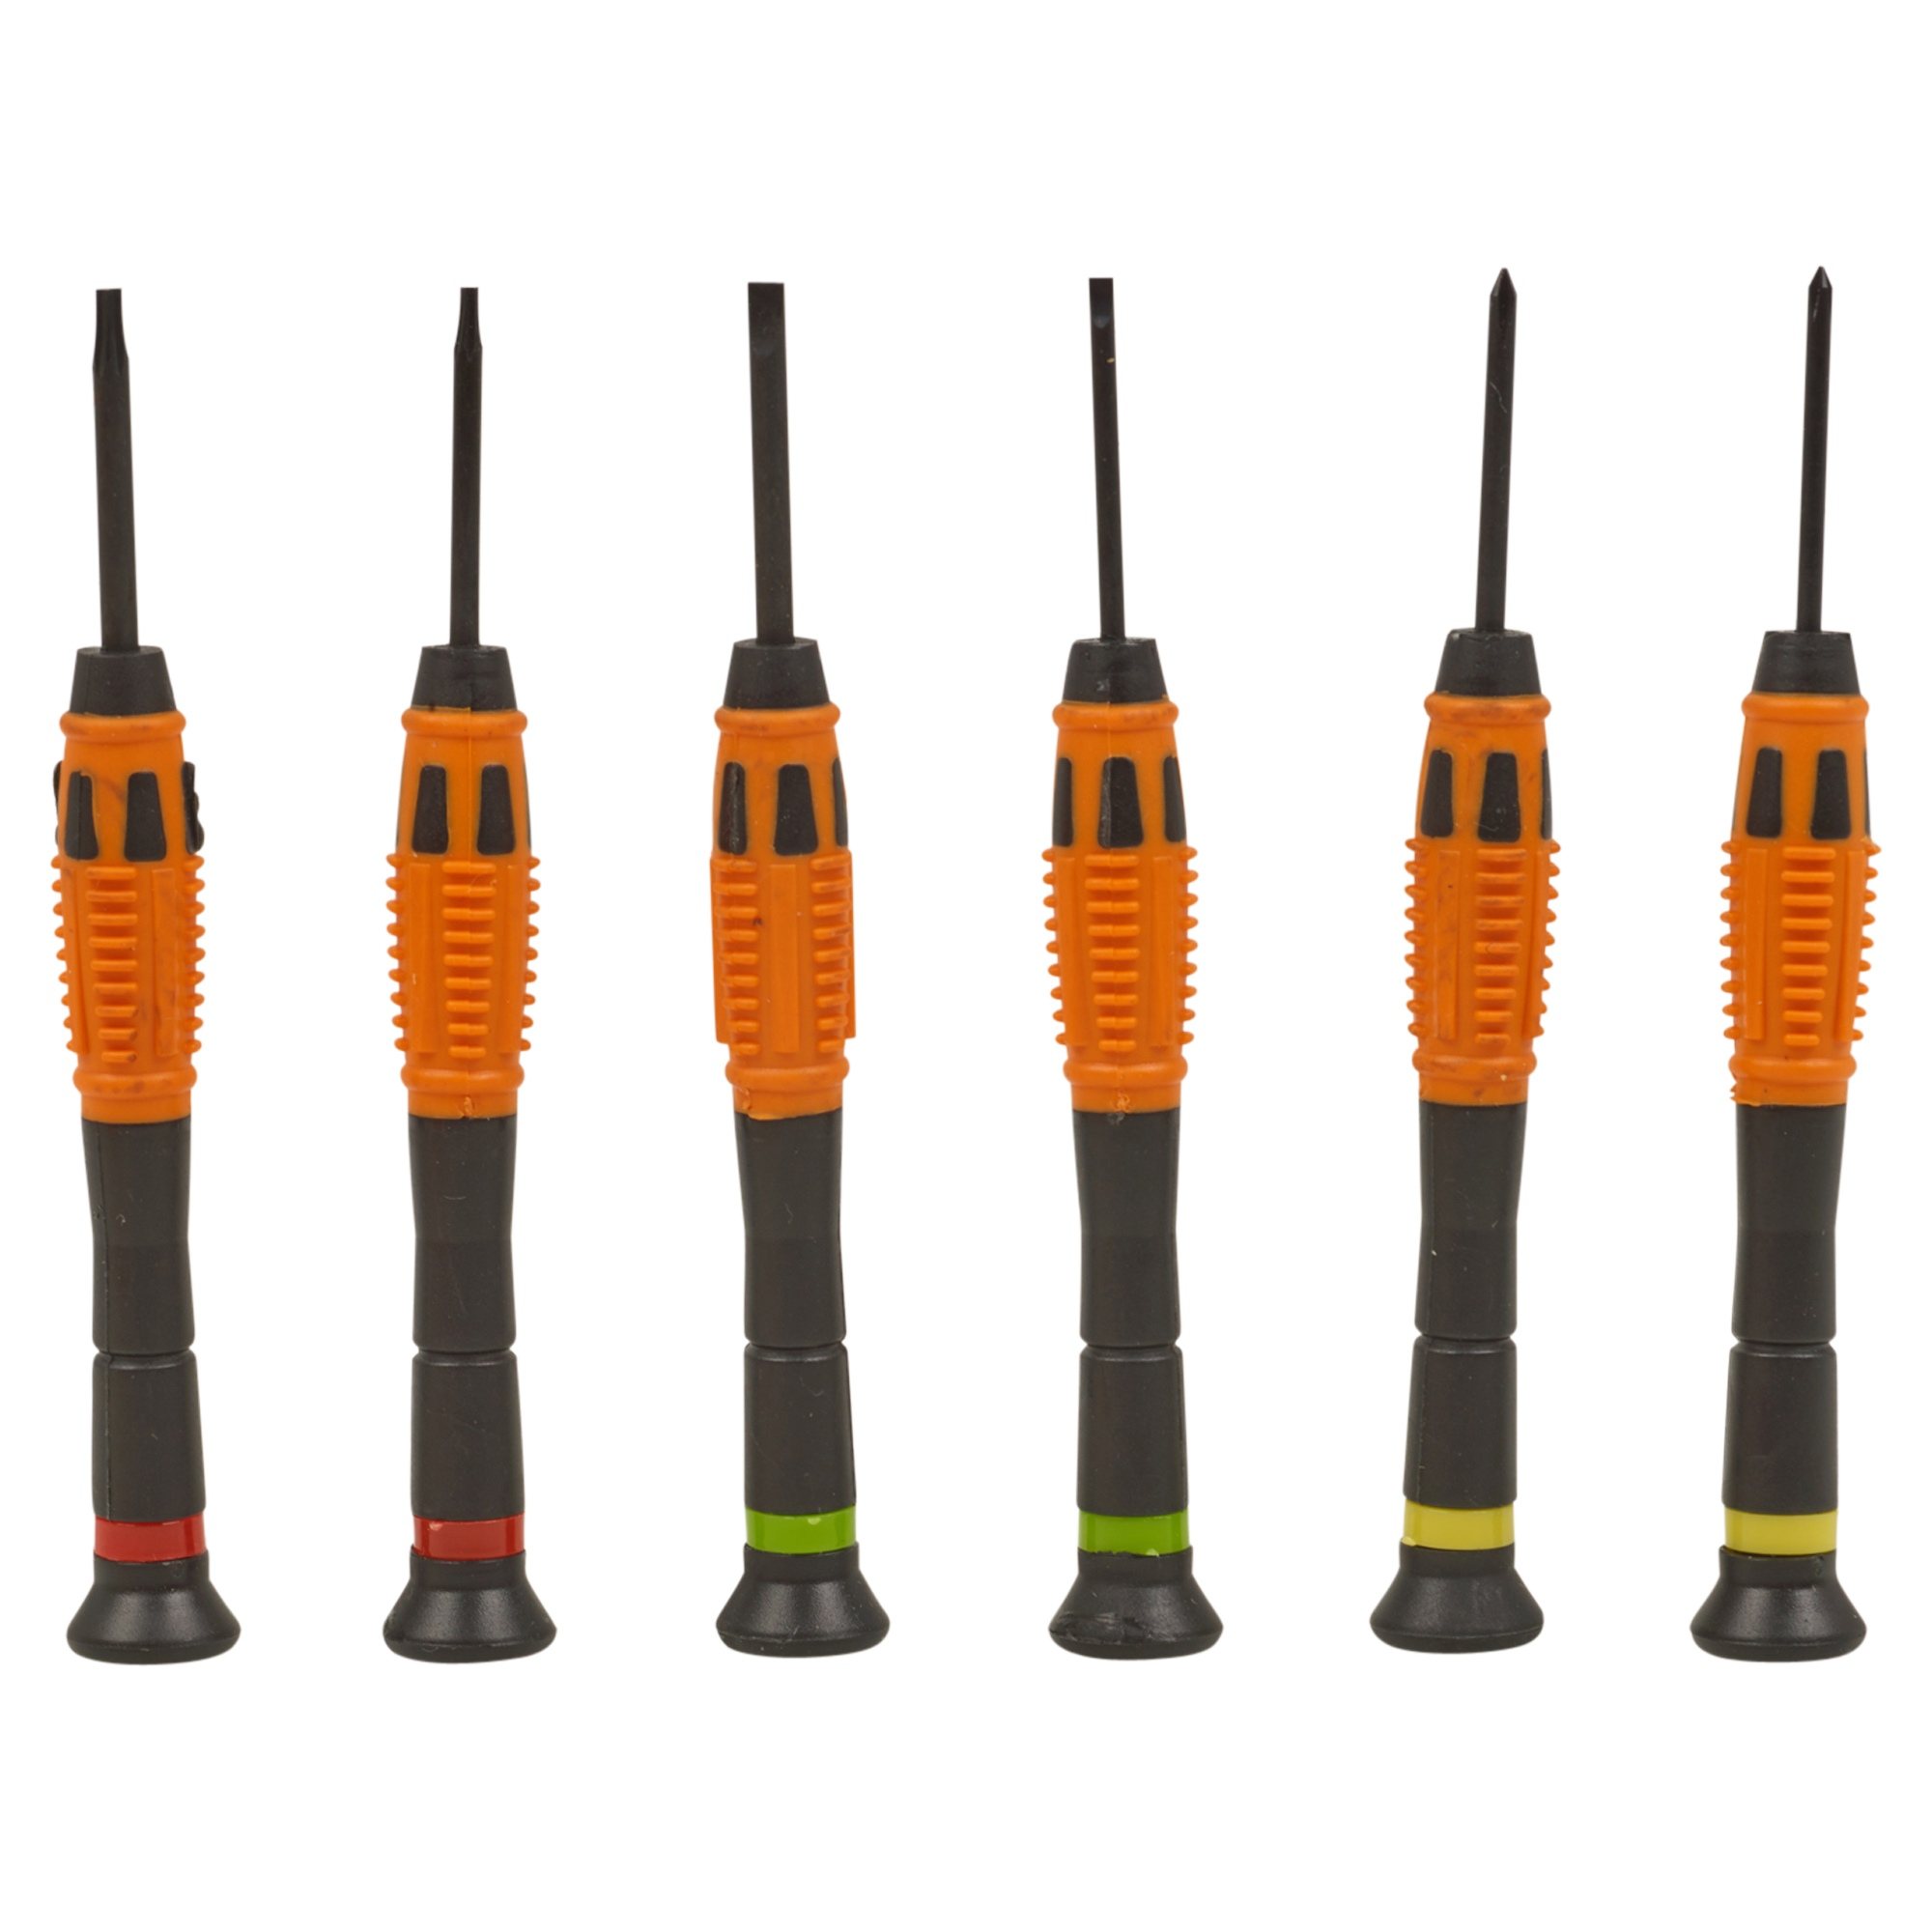 precision screwdriver set jeweller kit small screw driver mini 6pc torque torx ebay. Black Bedroom Furniture Sets. Home Design Ideas